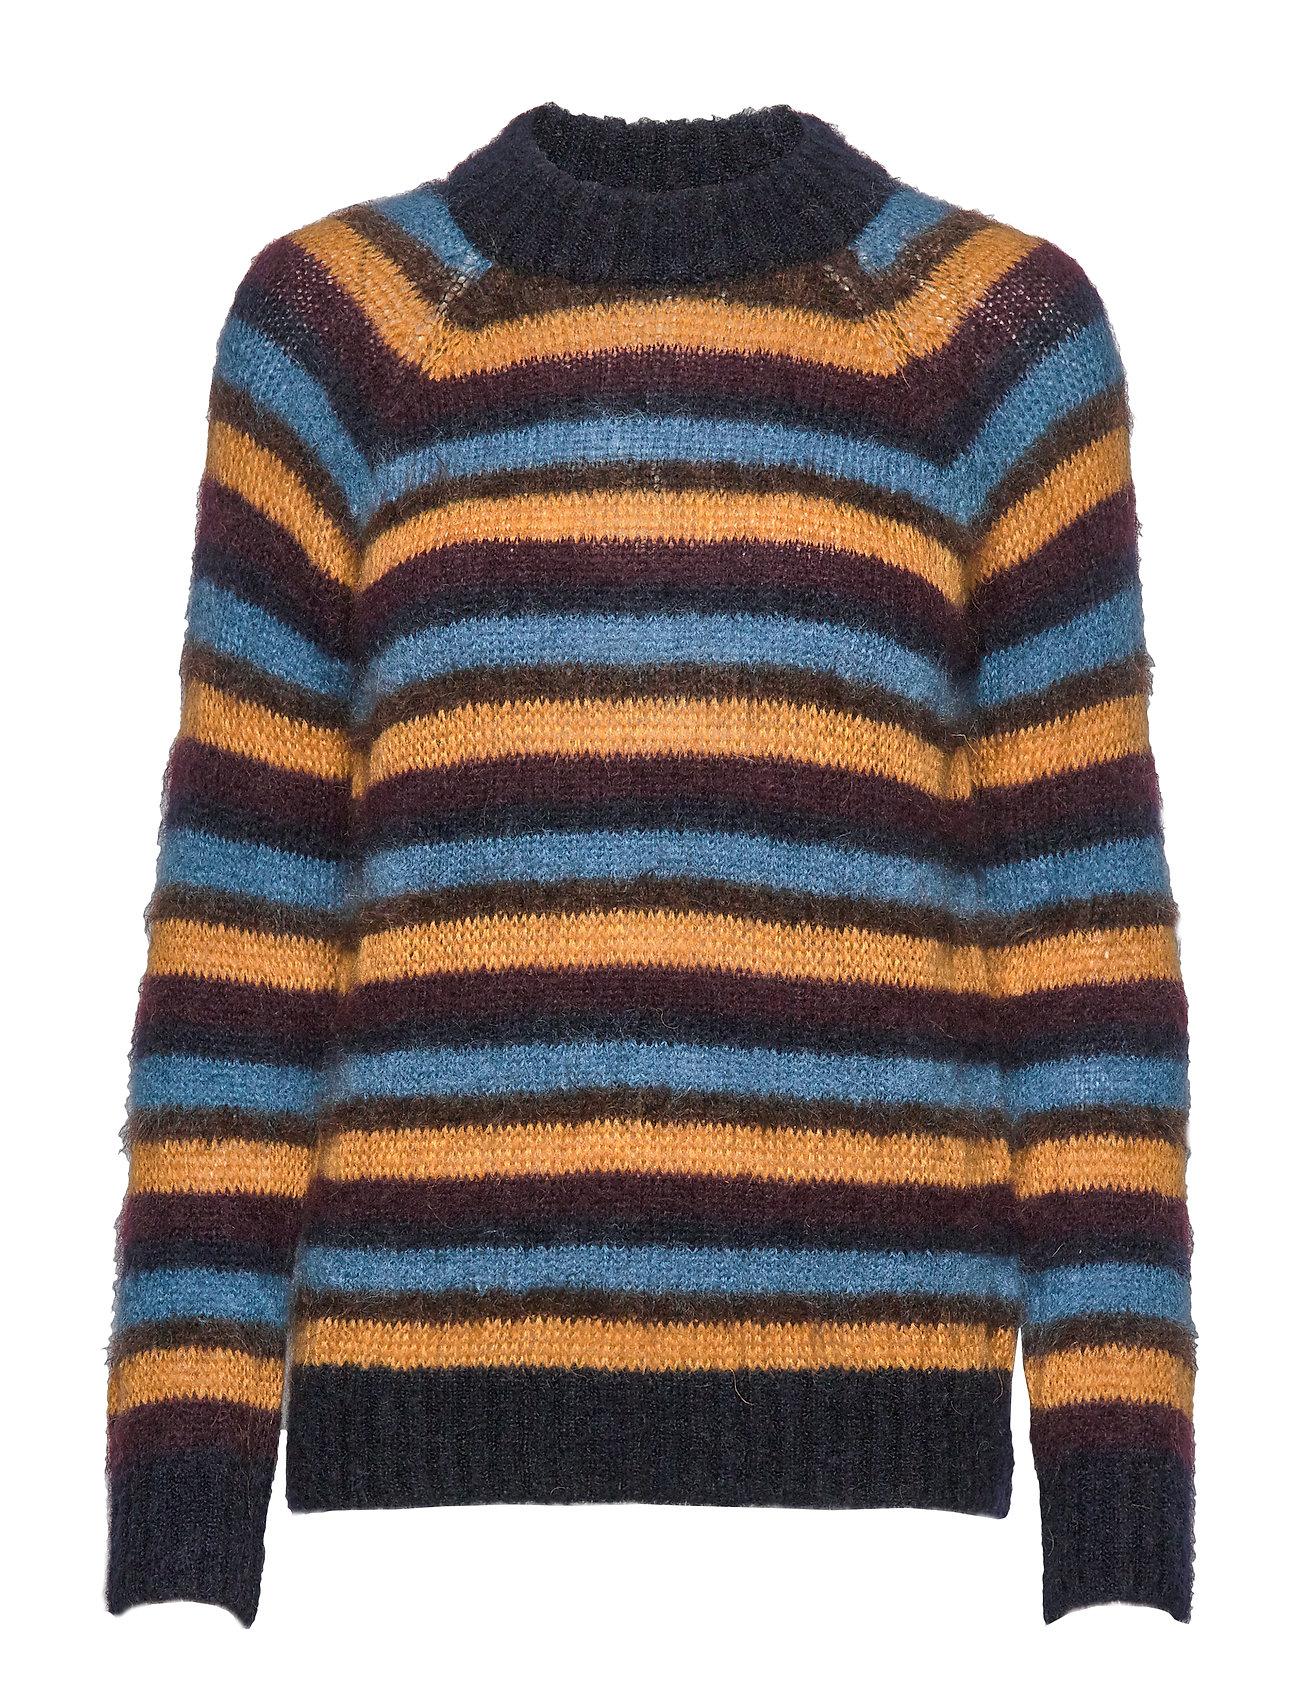 IBEN Marve Sweater STG - BLUE IRIS